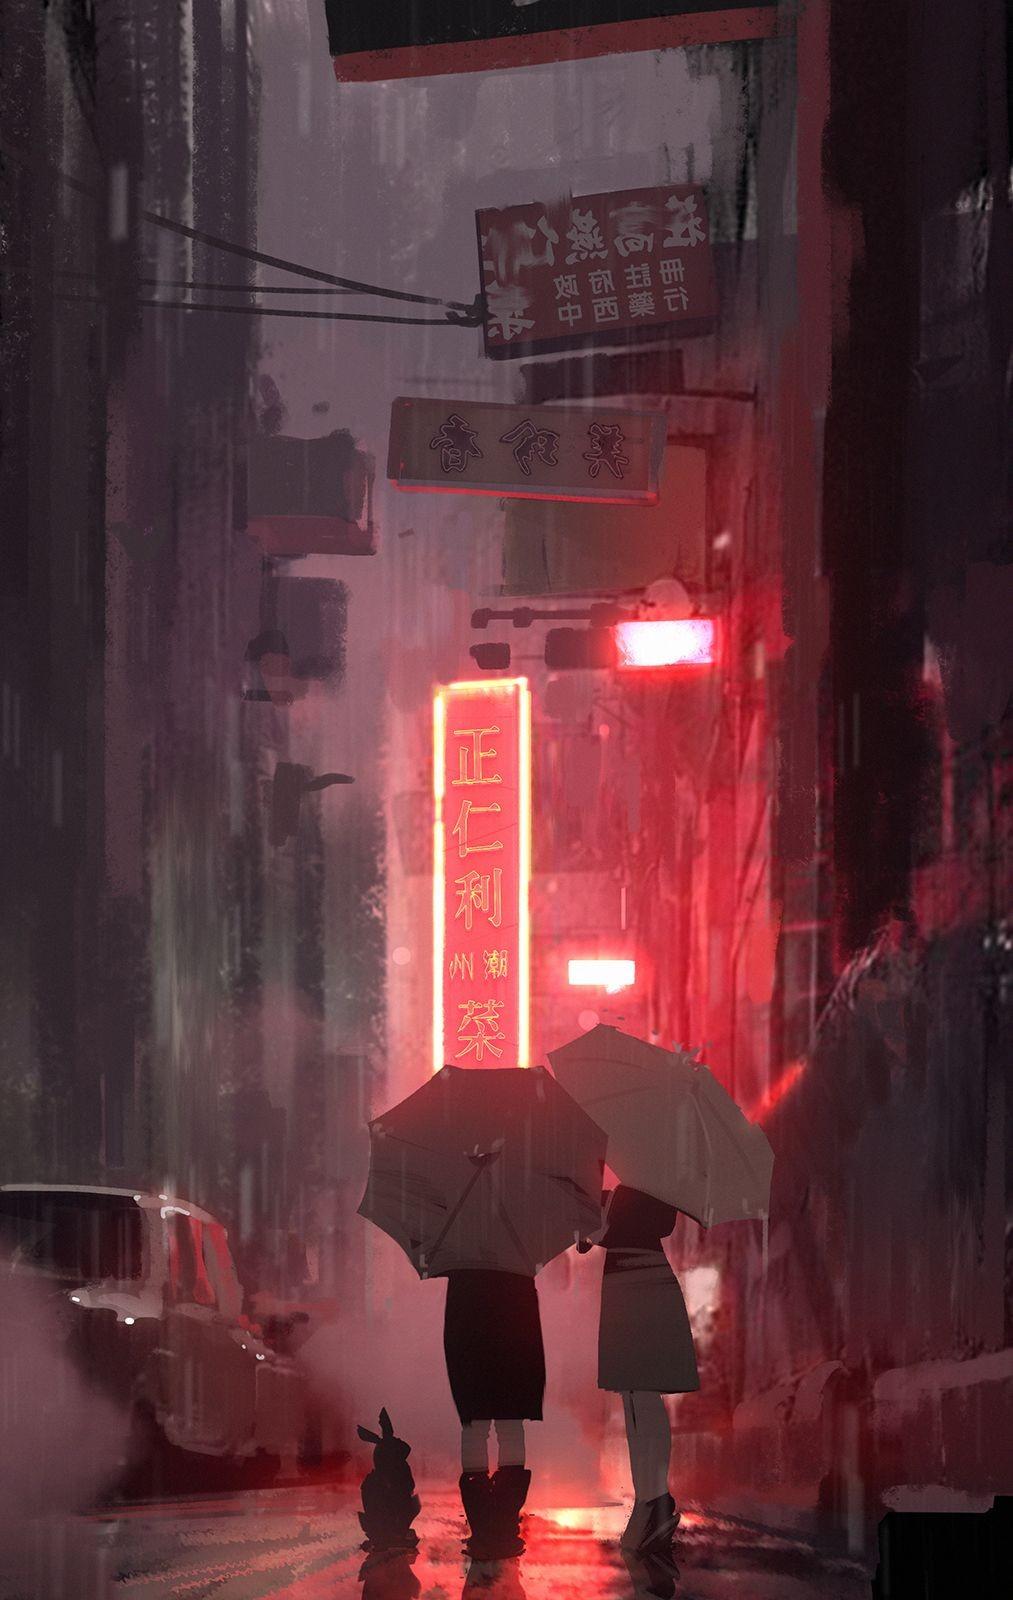 Anime 1013x1600 anime girls neon rain night umbrella snatti89 Atey Ghailan